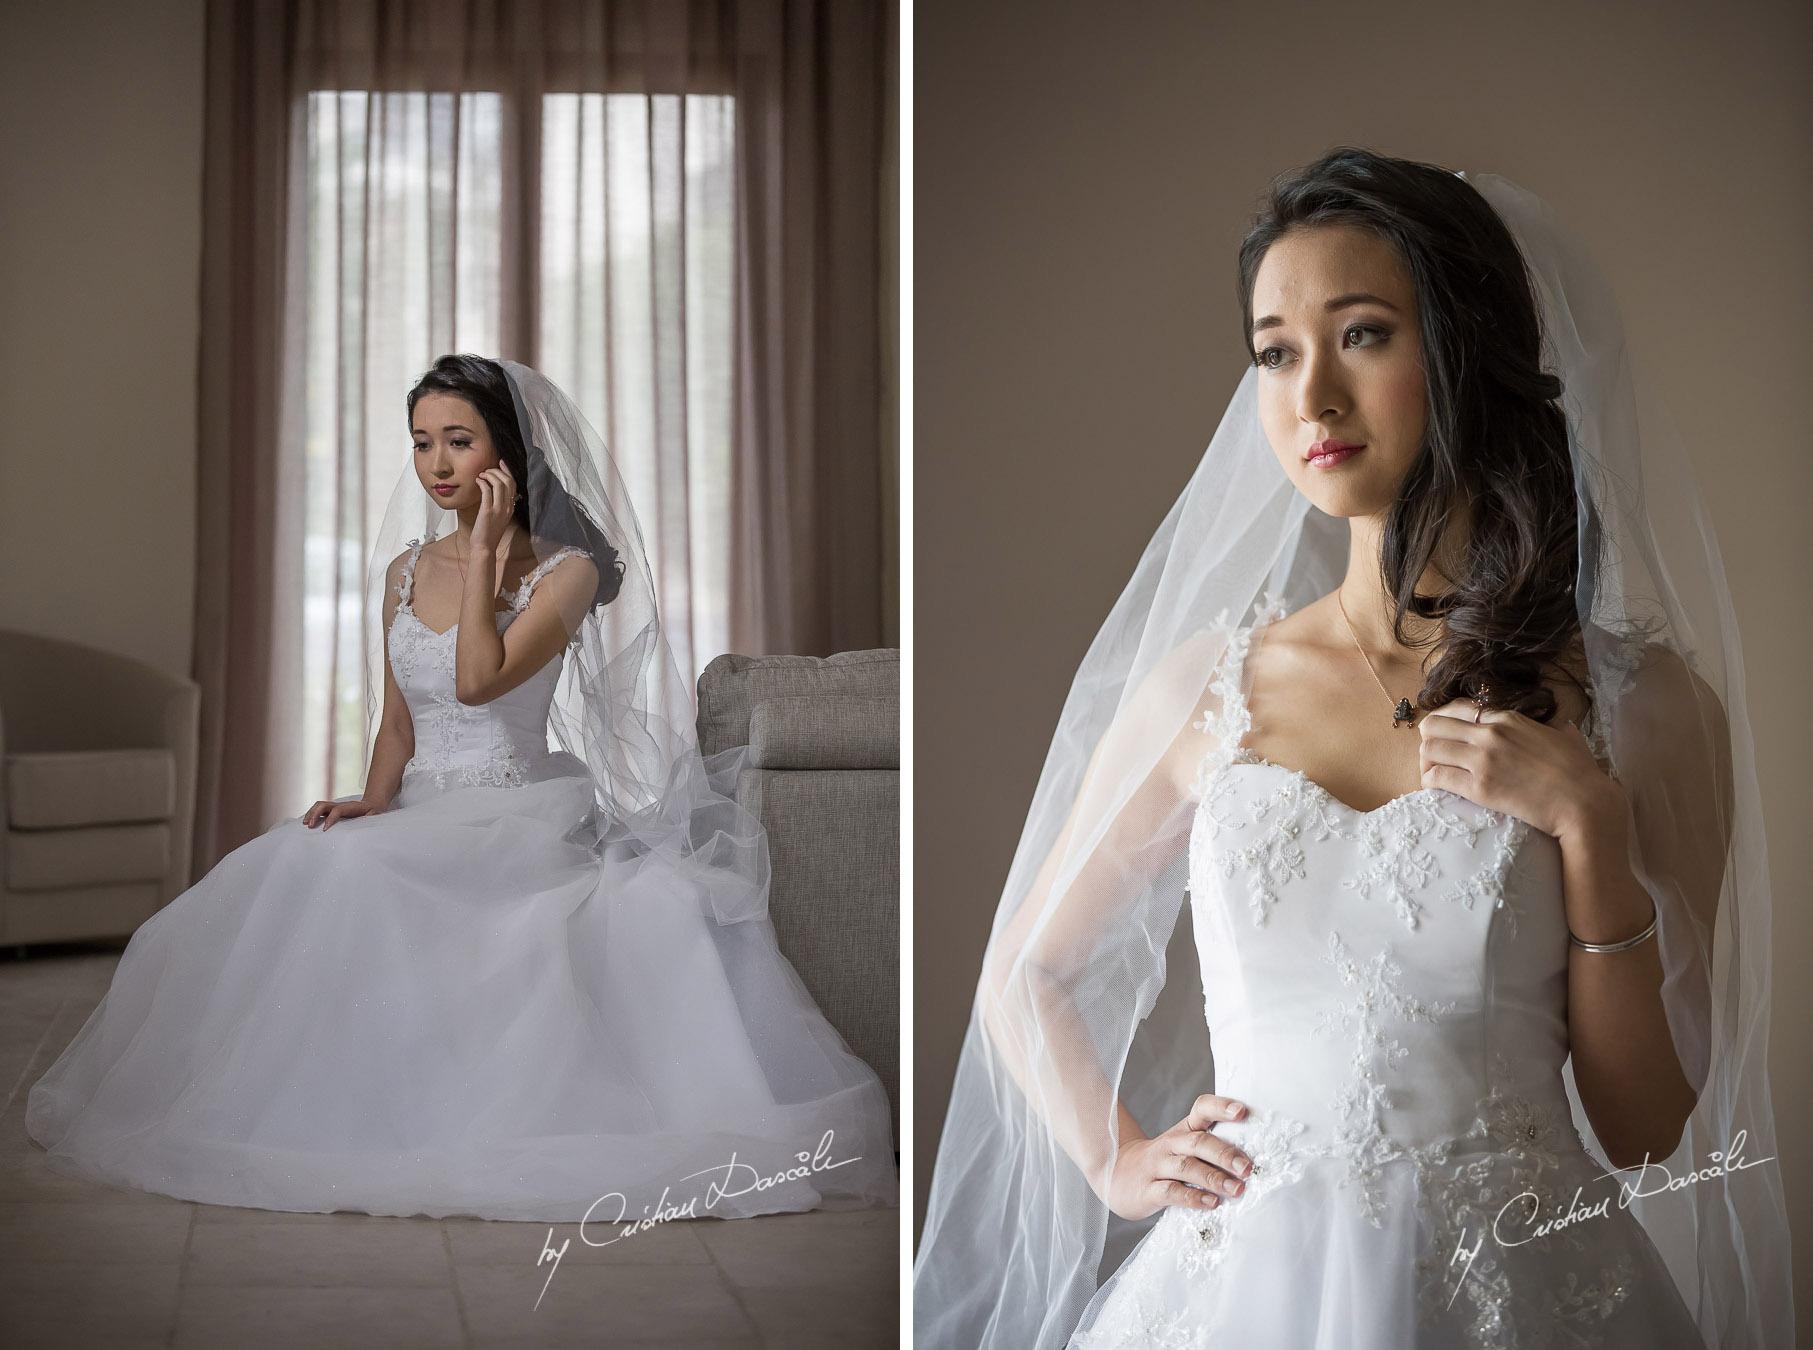 Pre Wedding Photoshoot in Cyprus - 01